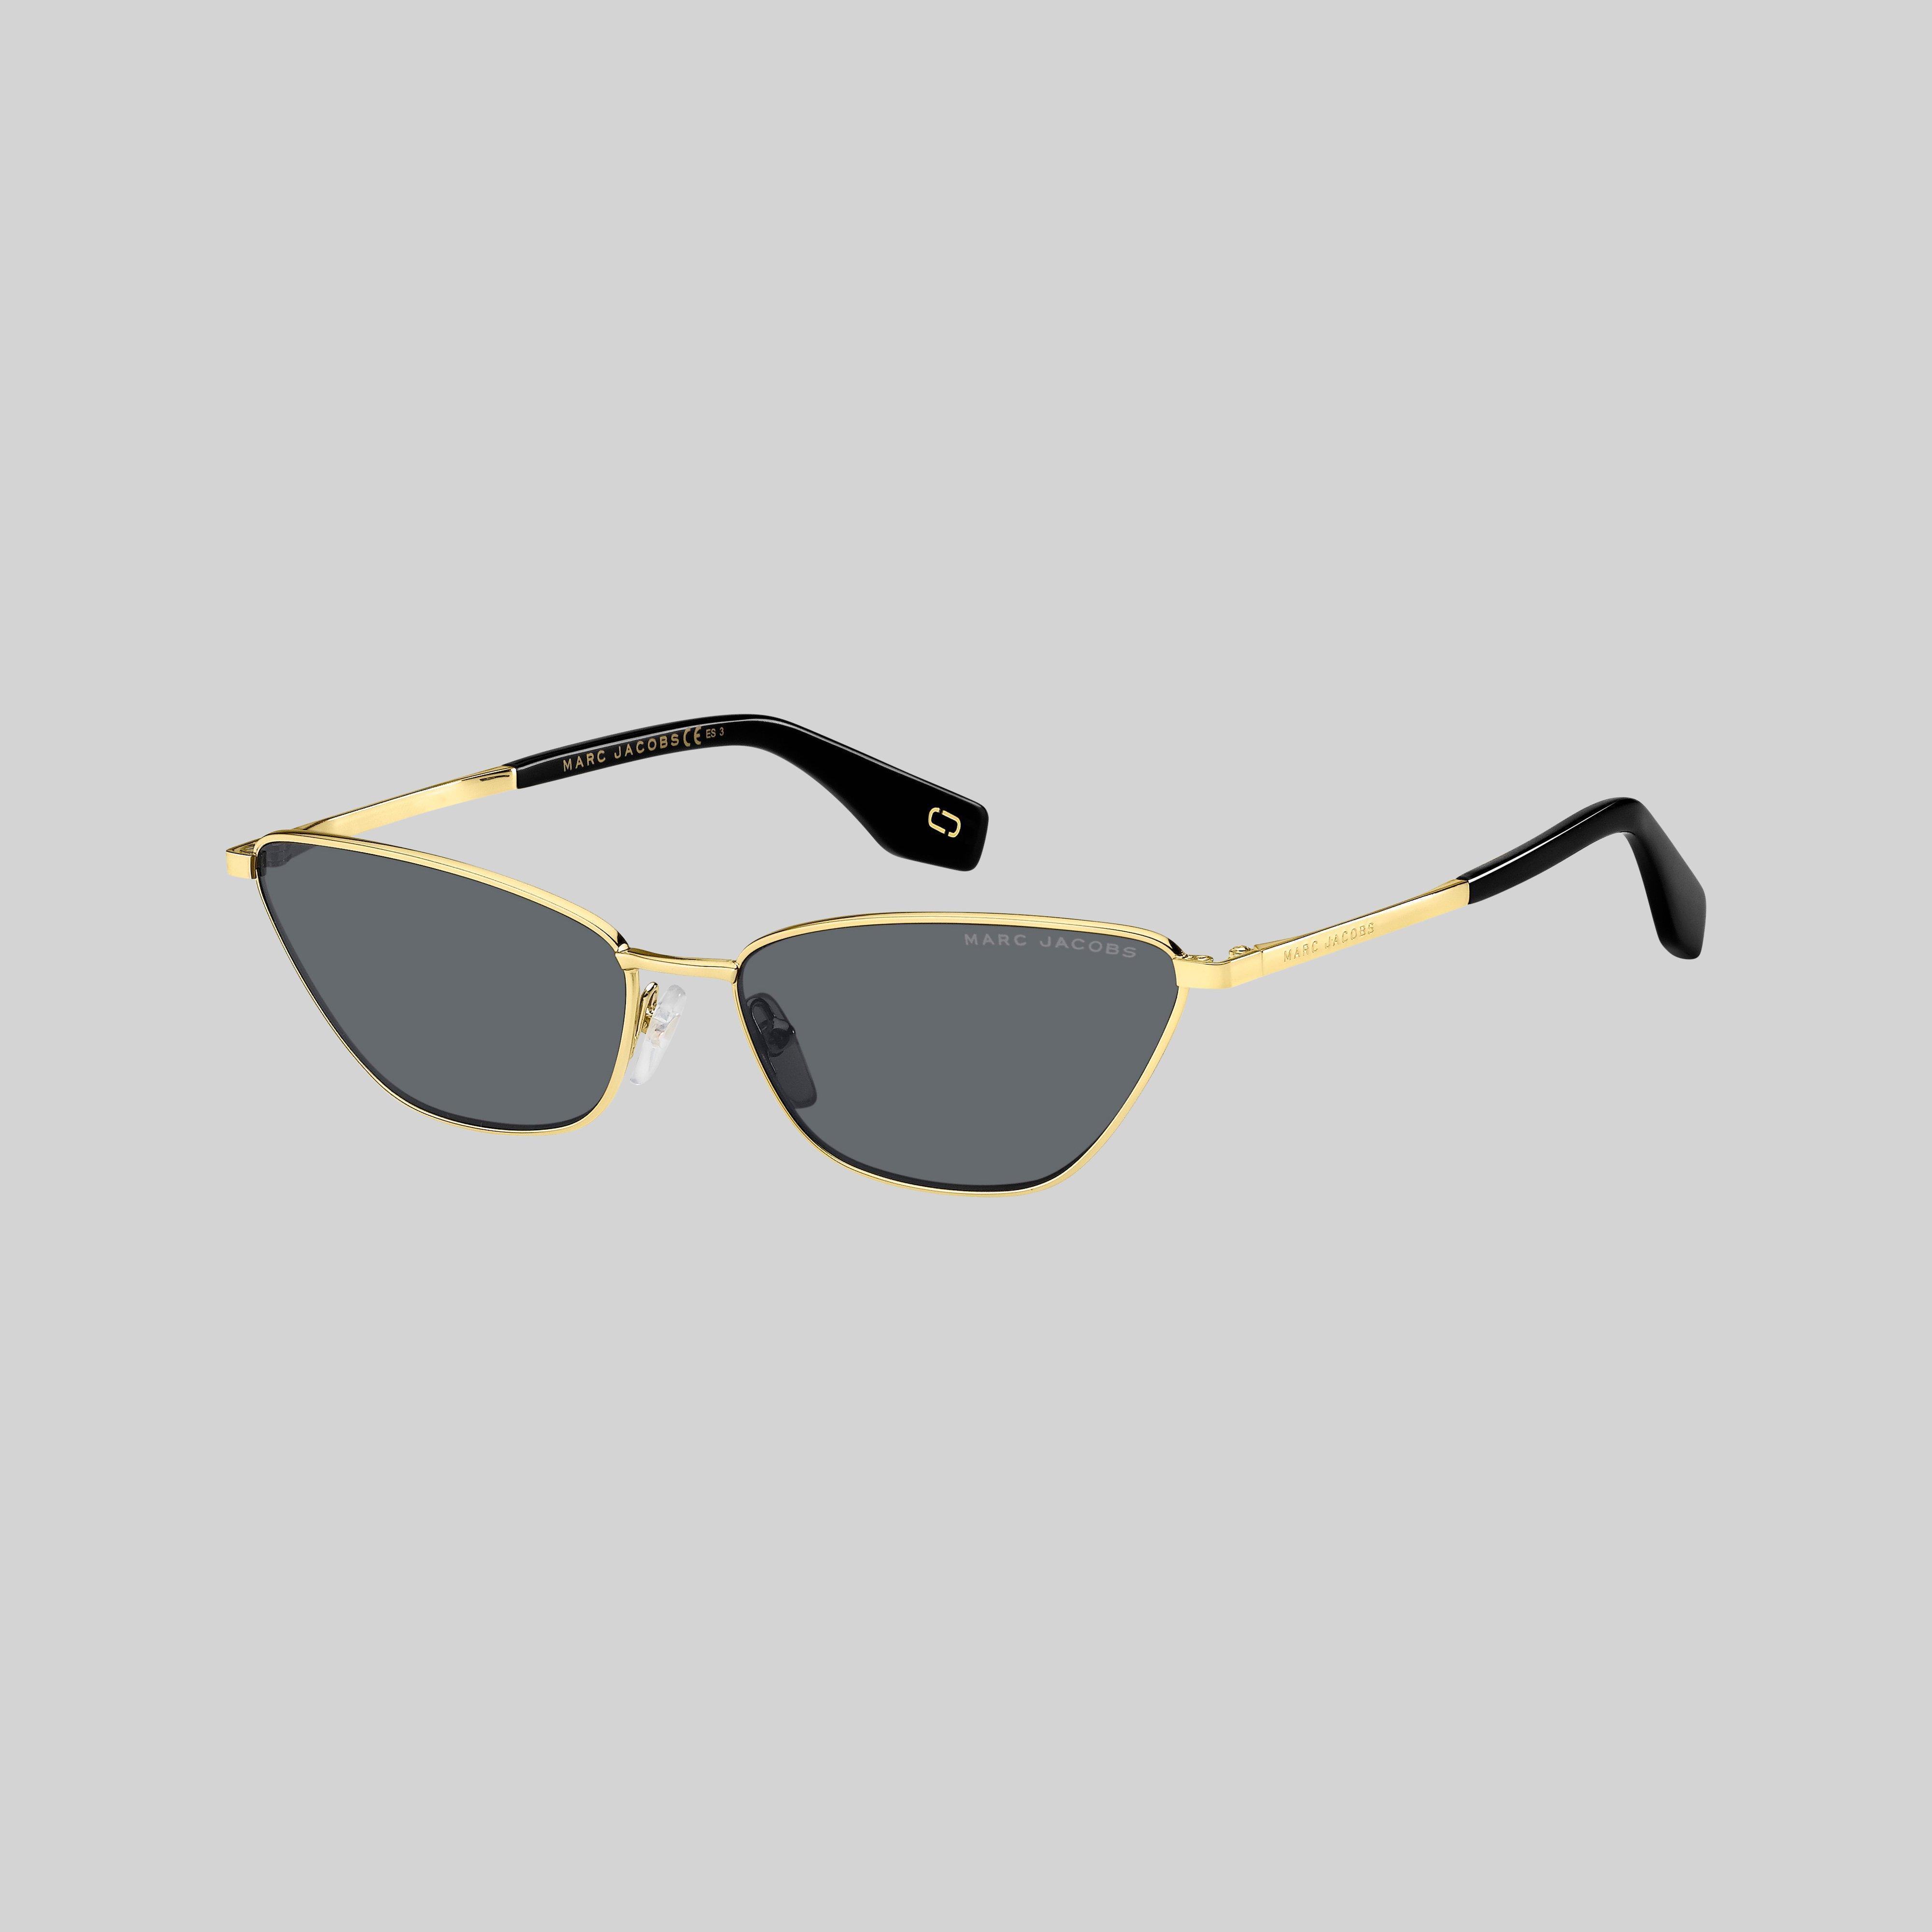 Large Oversized Thick Arm Metal Dot Women geo SQUARE Sunglasses Vintage